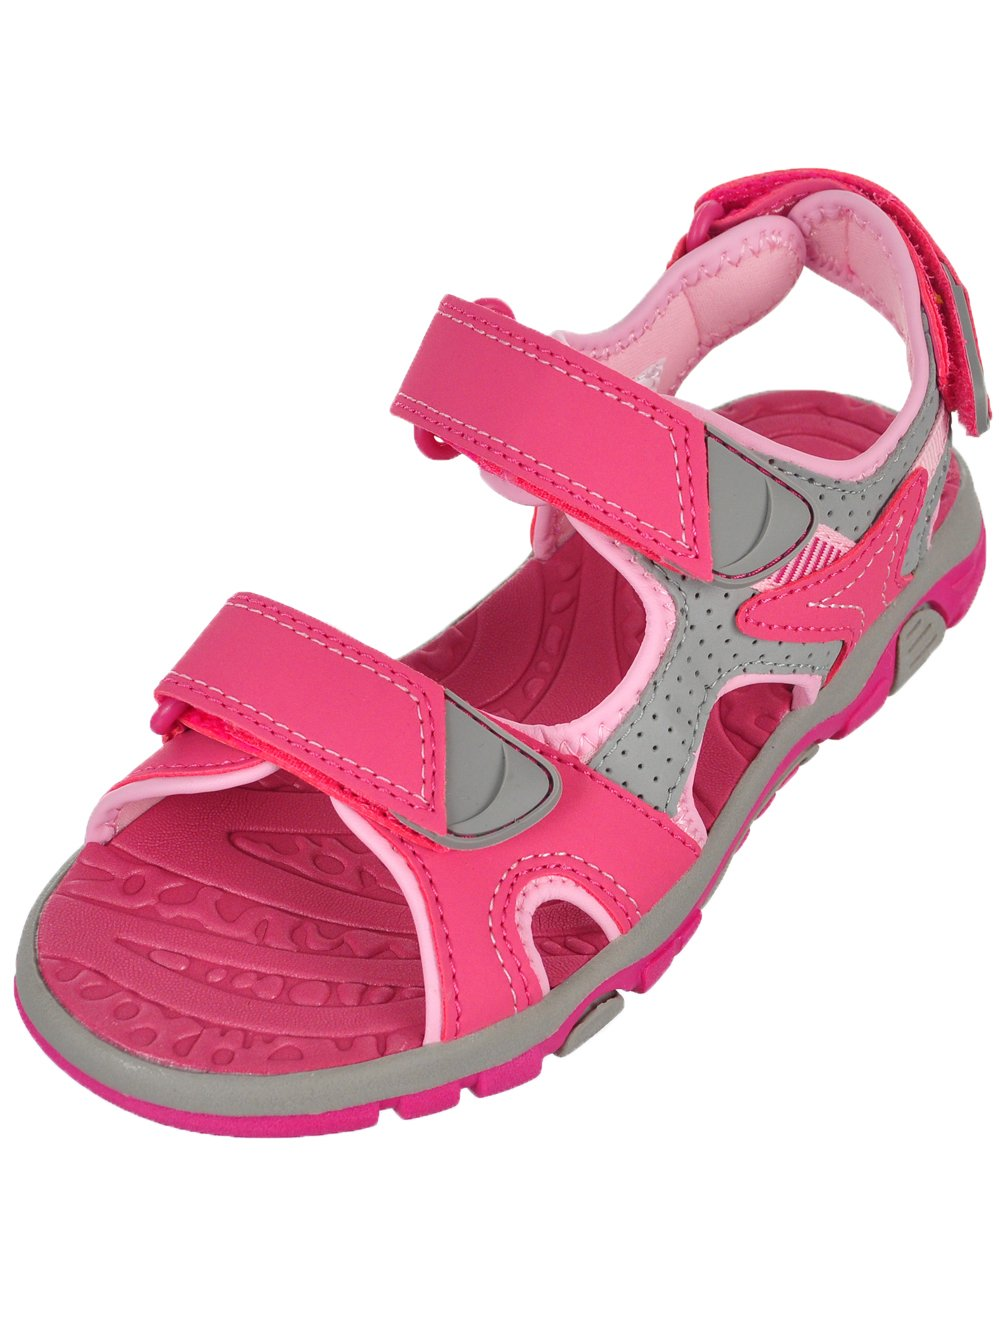 Khombu Girls' River Sandal Pink/Grey